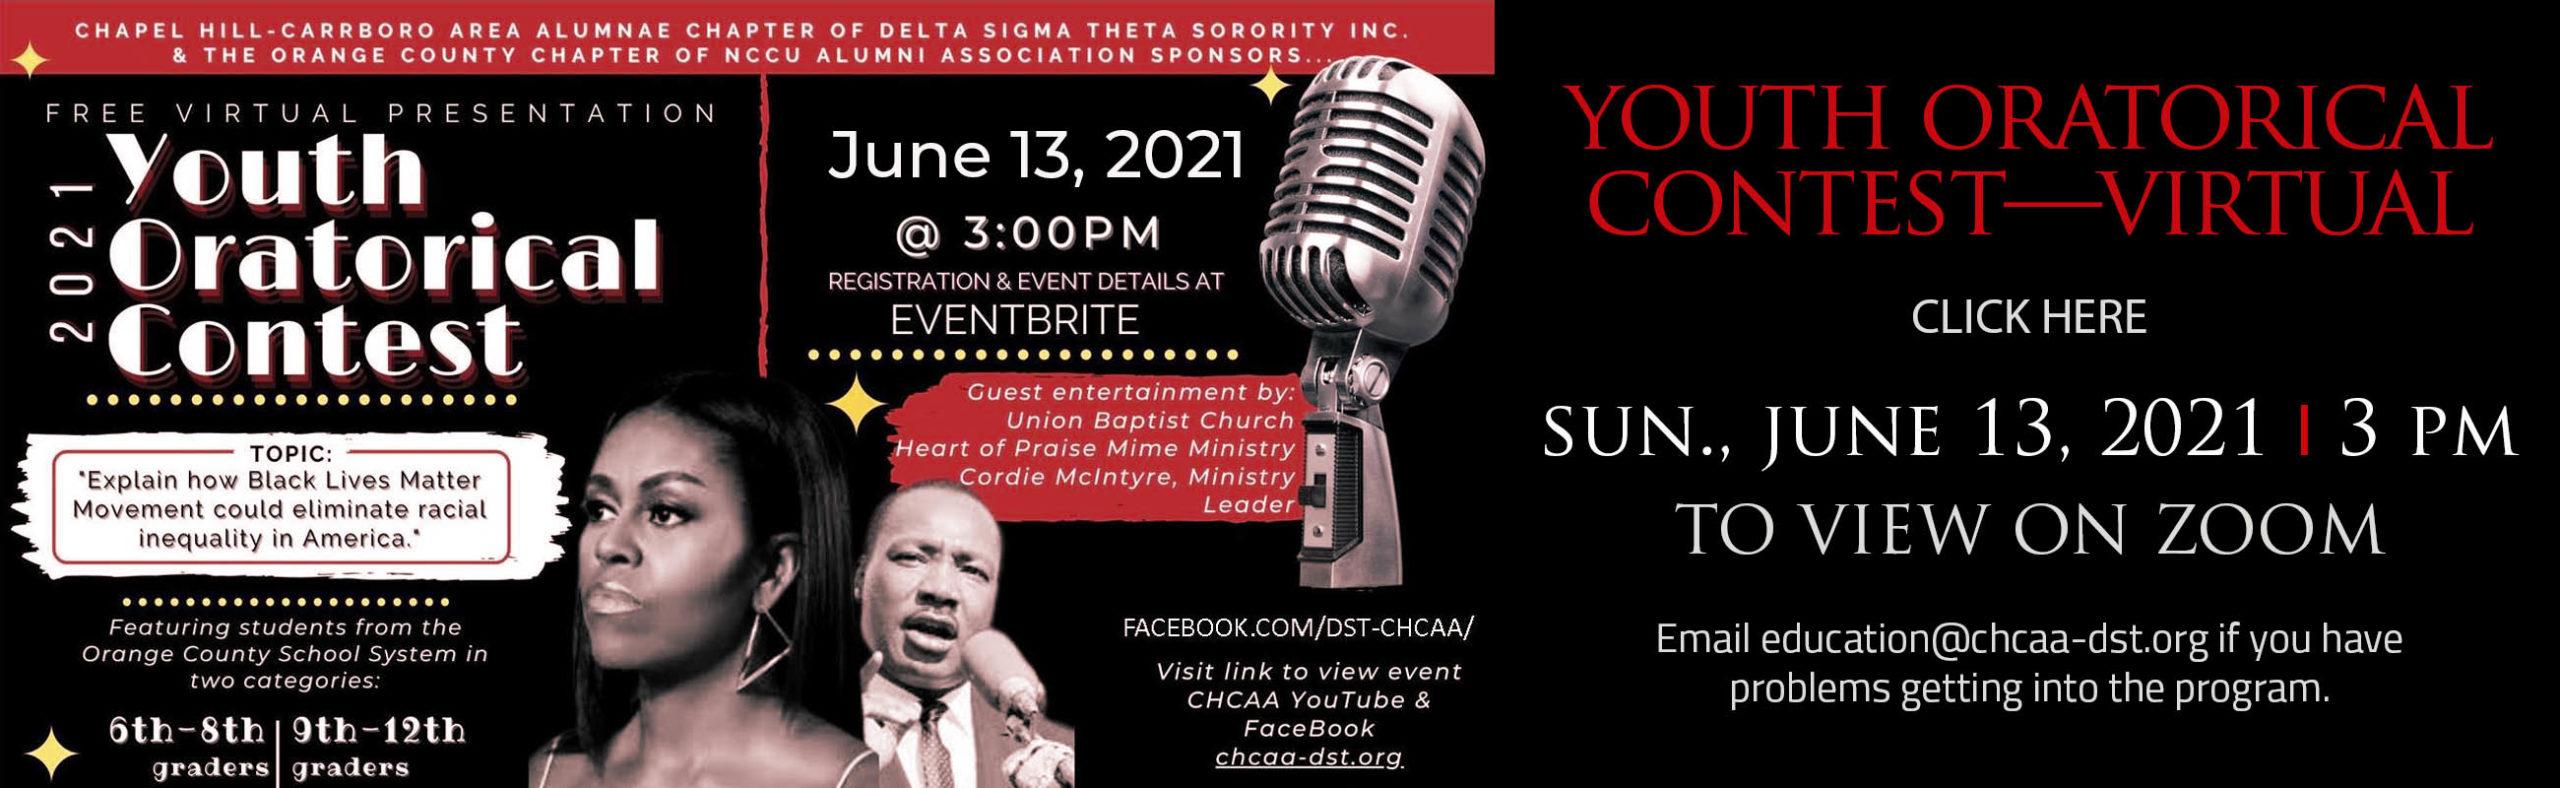 CHCAA-Youth-Oratorical-2021-Zoom